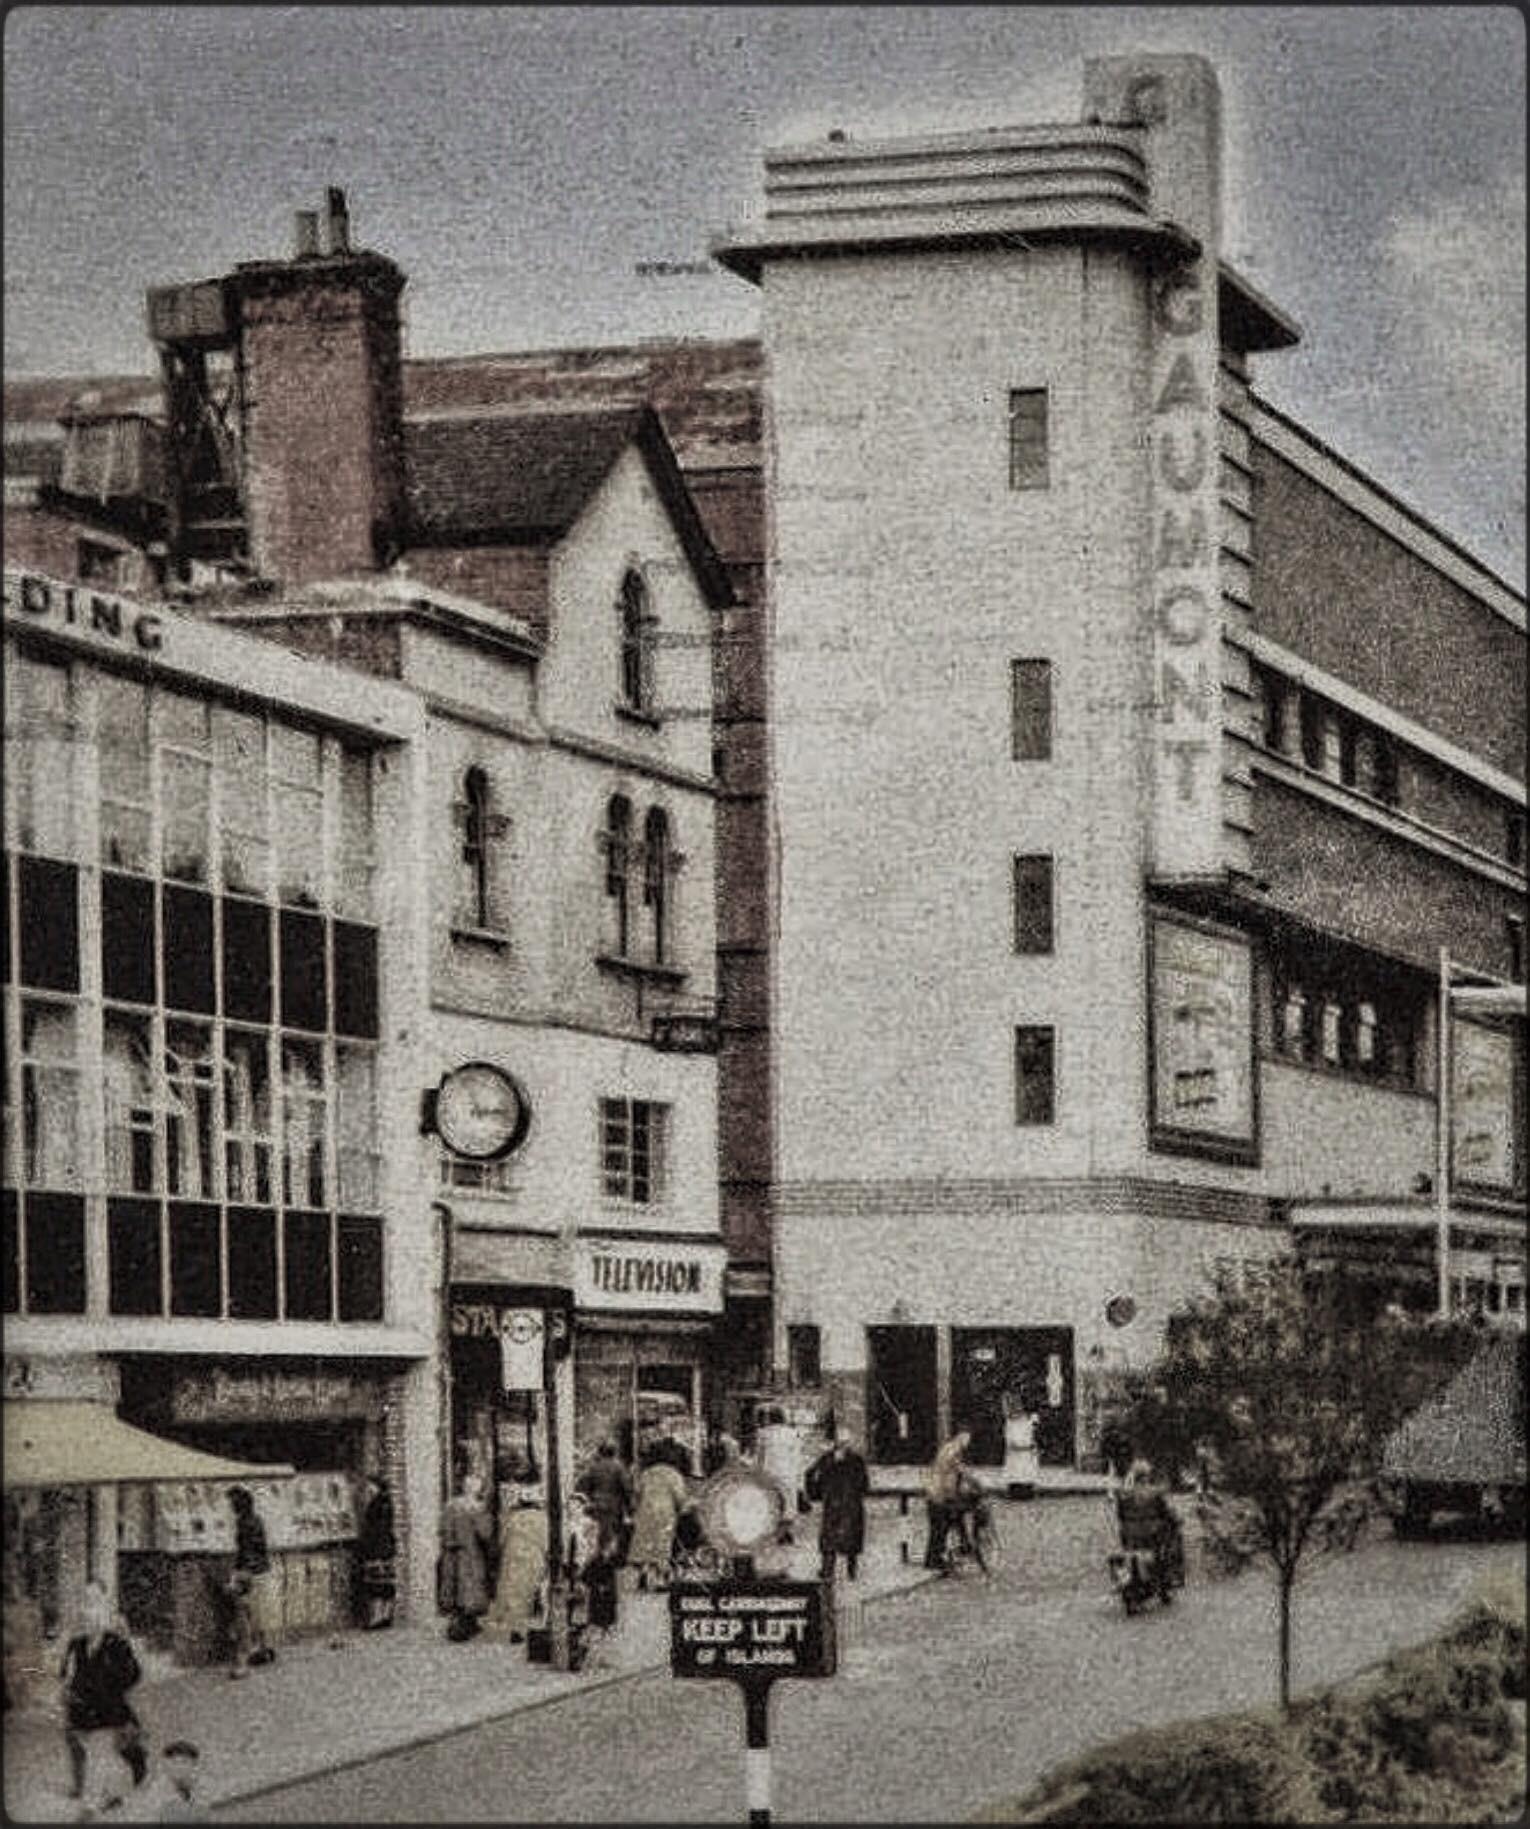 Gaumont Cinema on high street